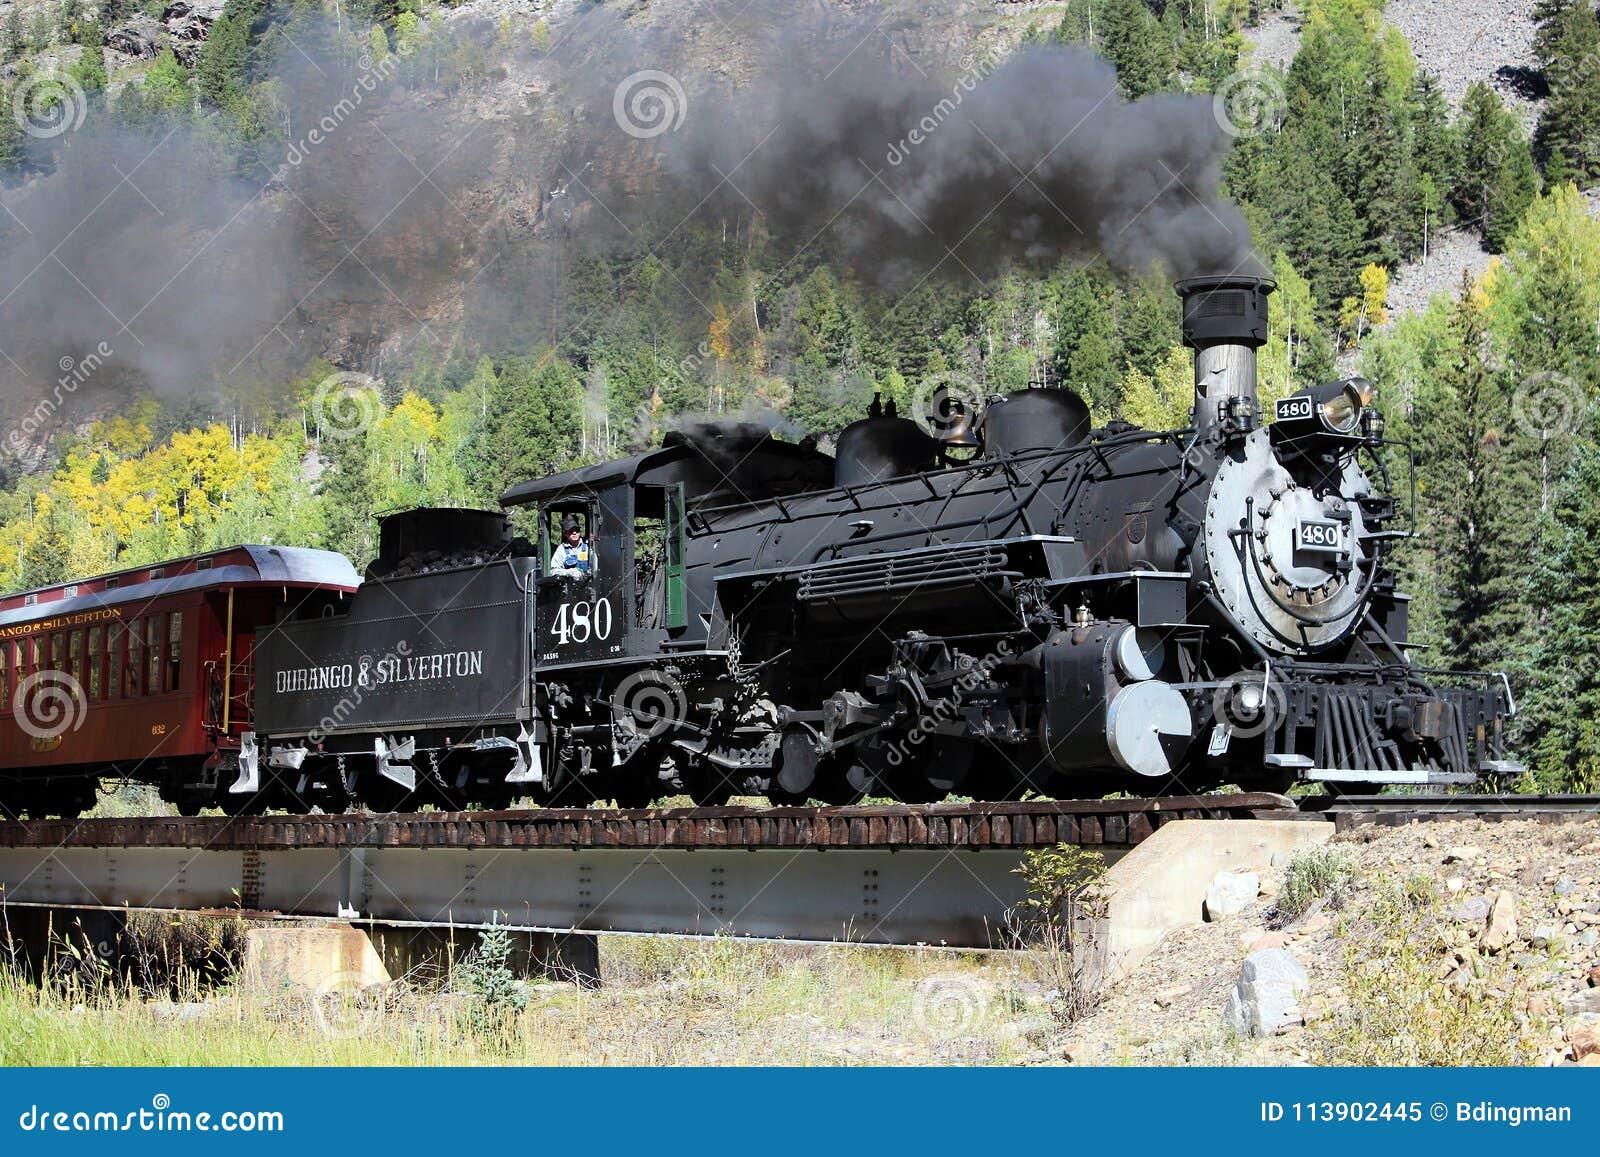 Фото узких поездов, порно фото красоток крупно